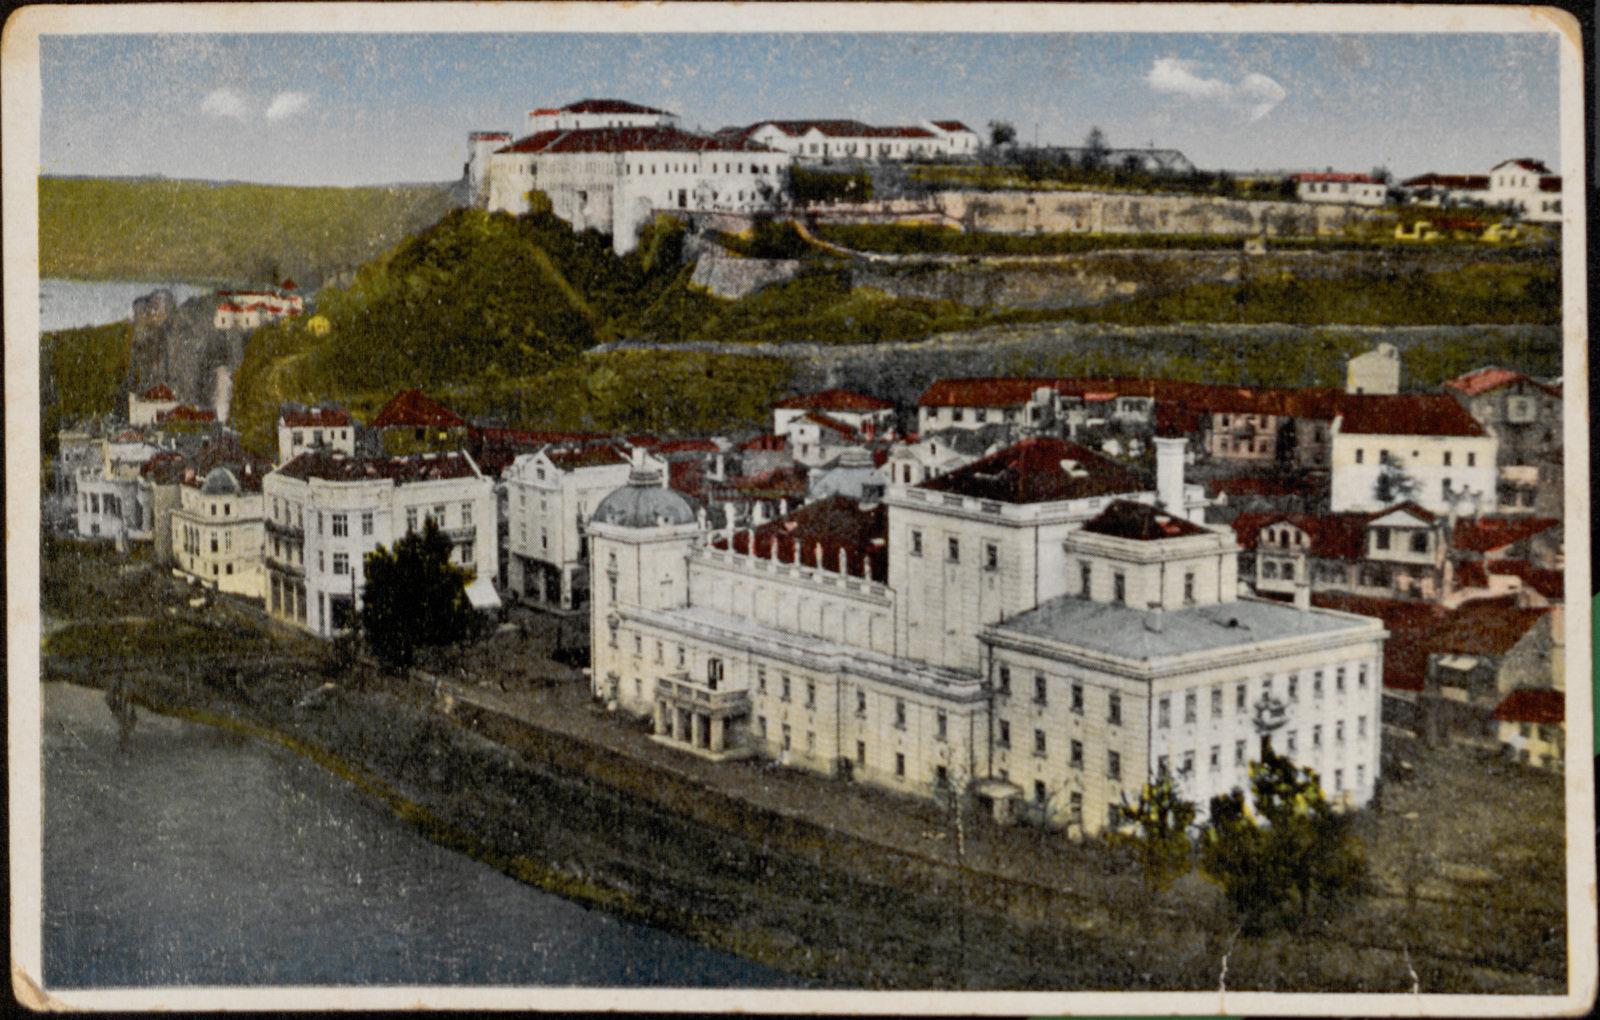 The National Theatre, Skopje, 1927, Trajko B. Stolić, National and University Library, Skopje, CC BY-NC-ND